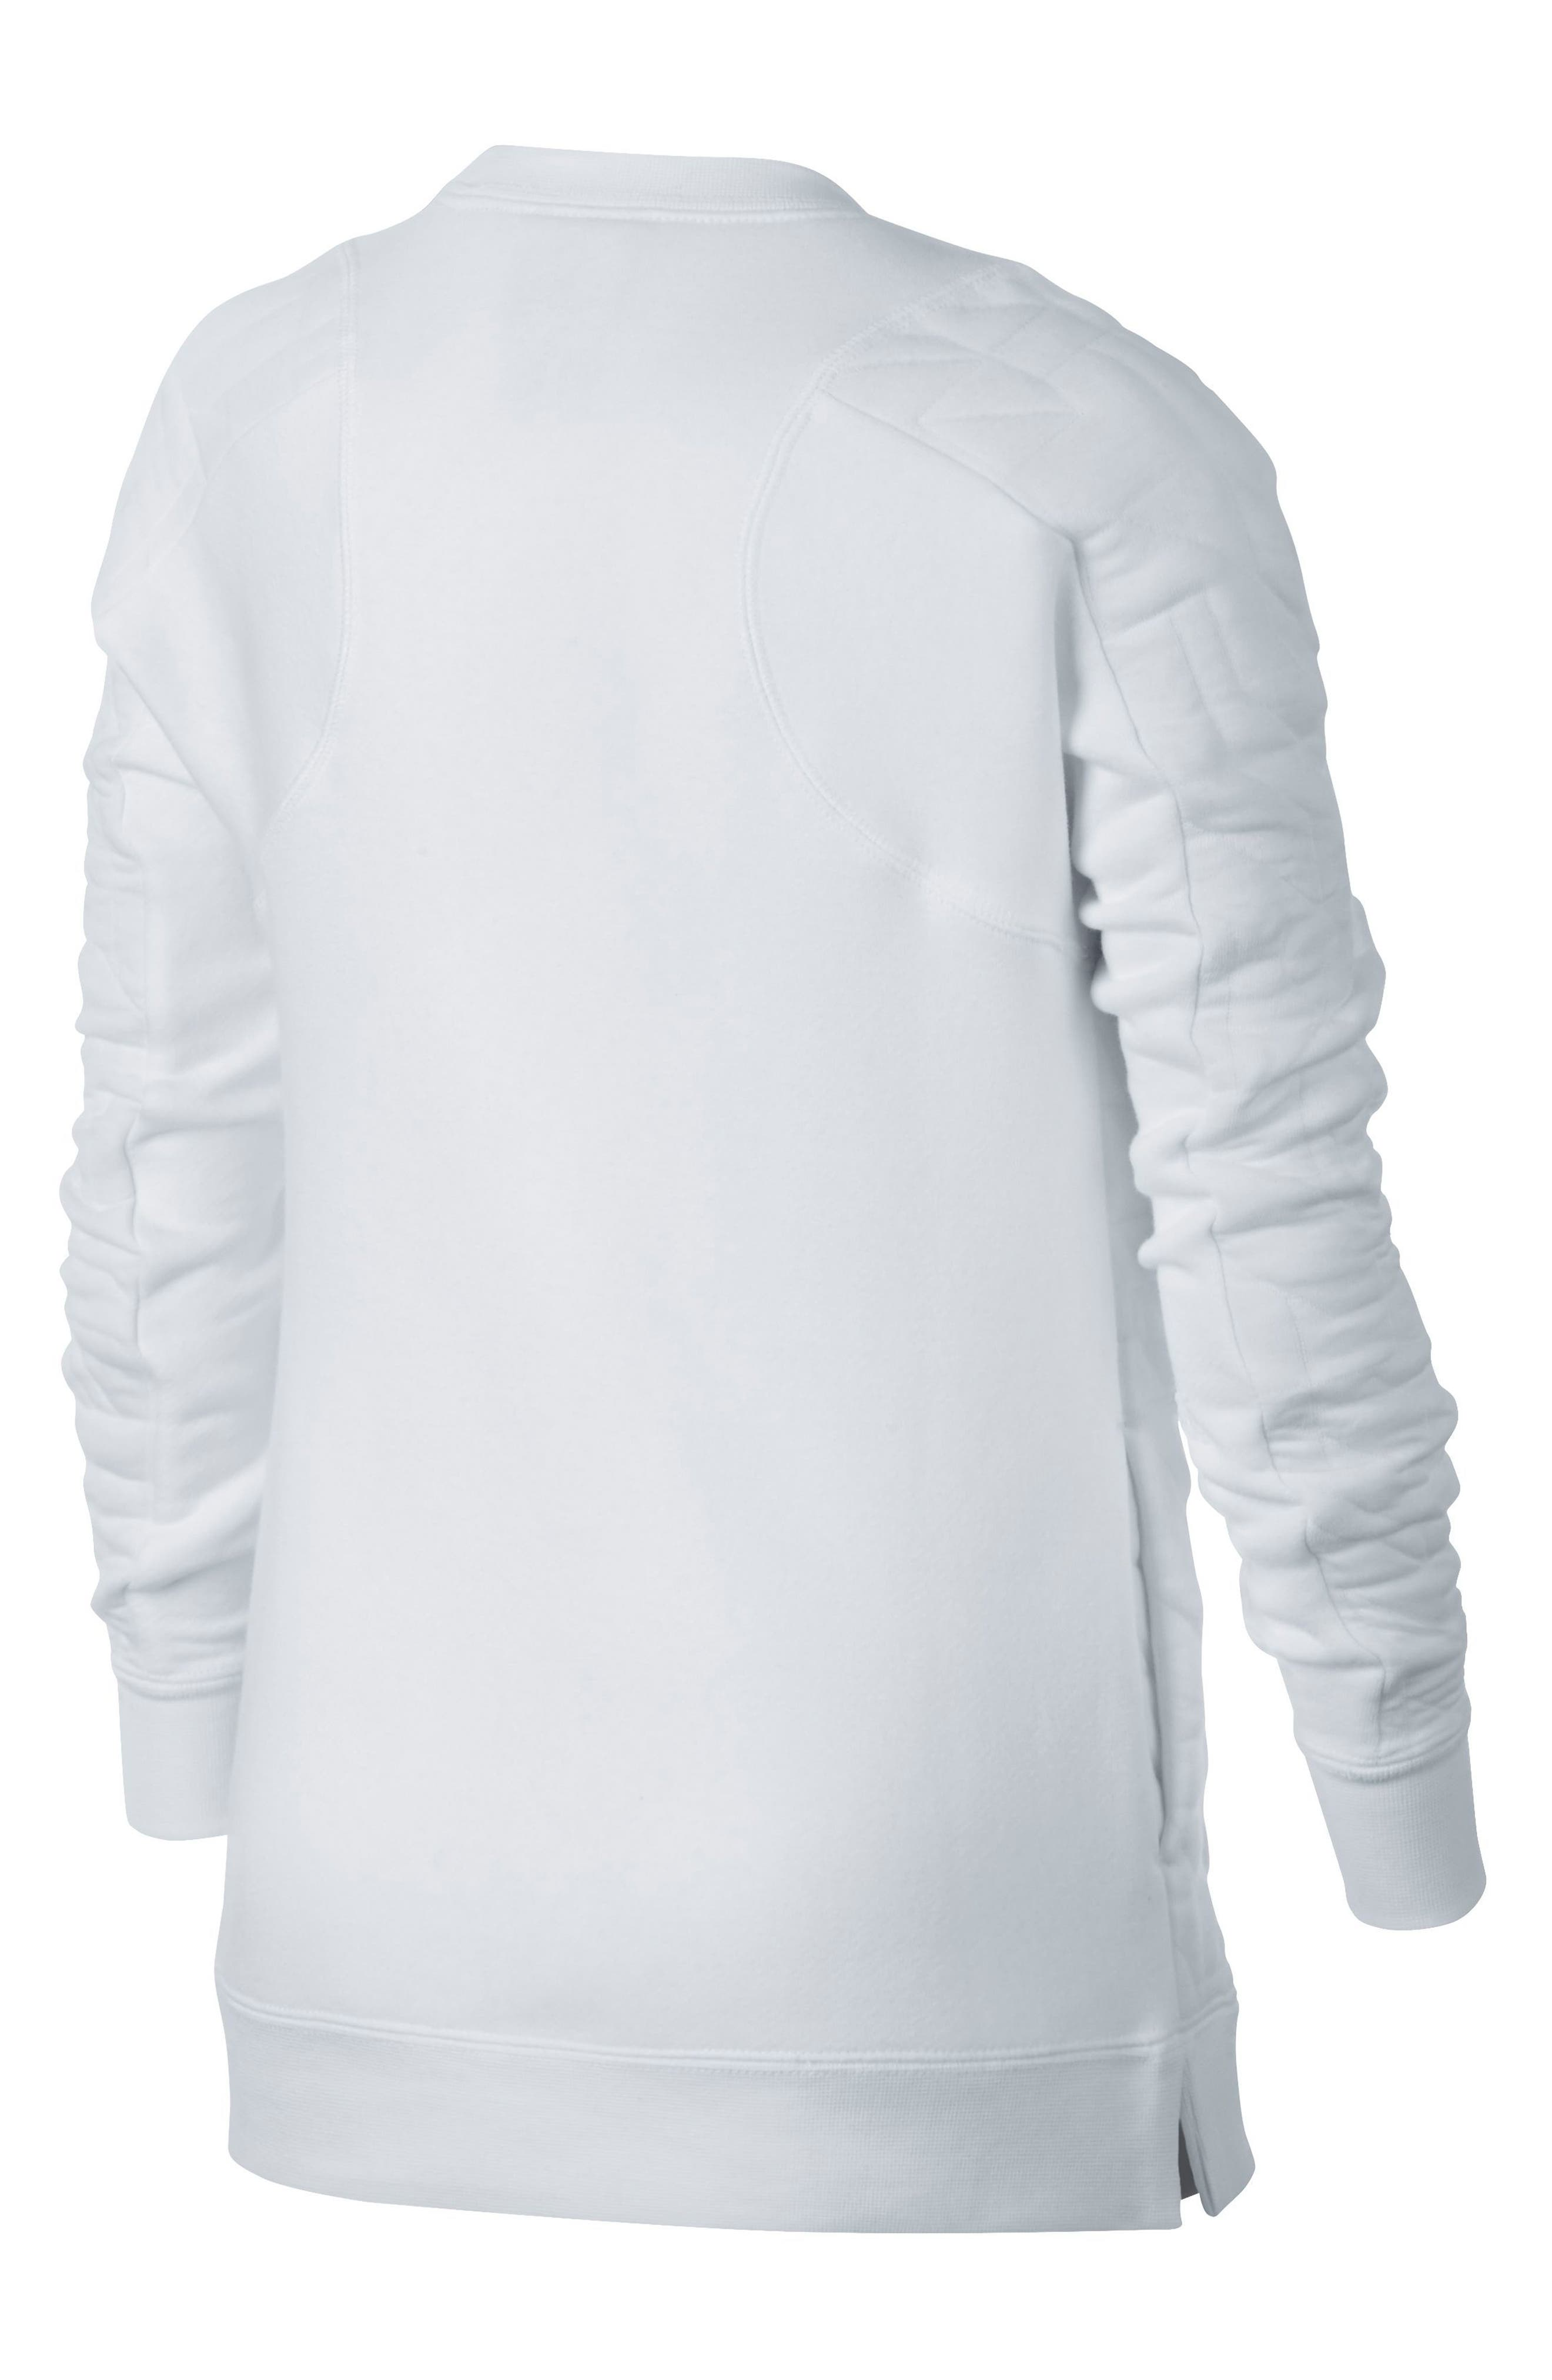 Modern Matelassé Sweatshirt,                             Alternate thumbnail 2, color,                             White/ Black